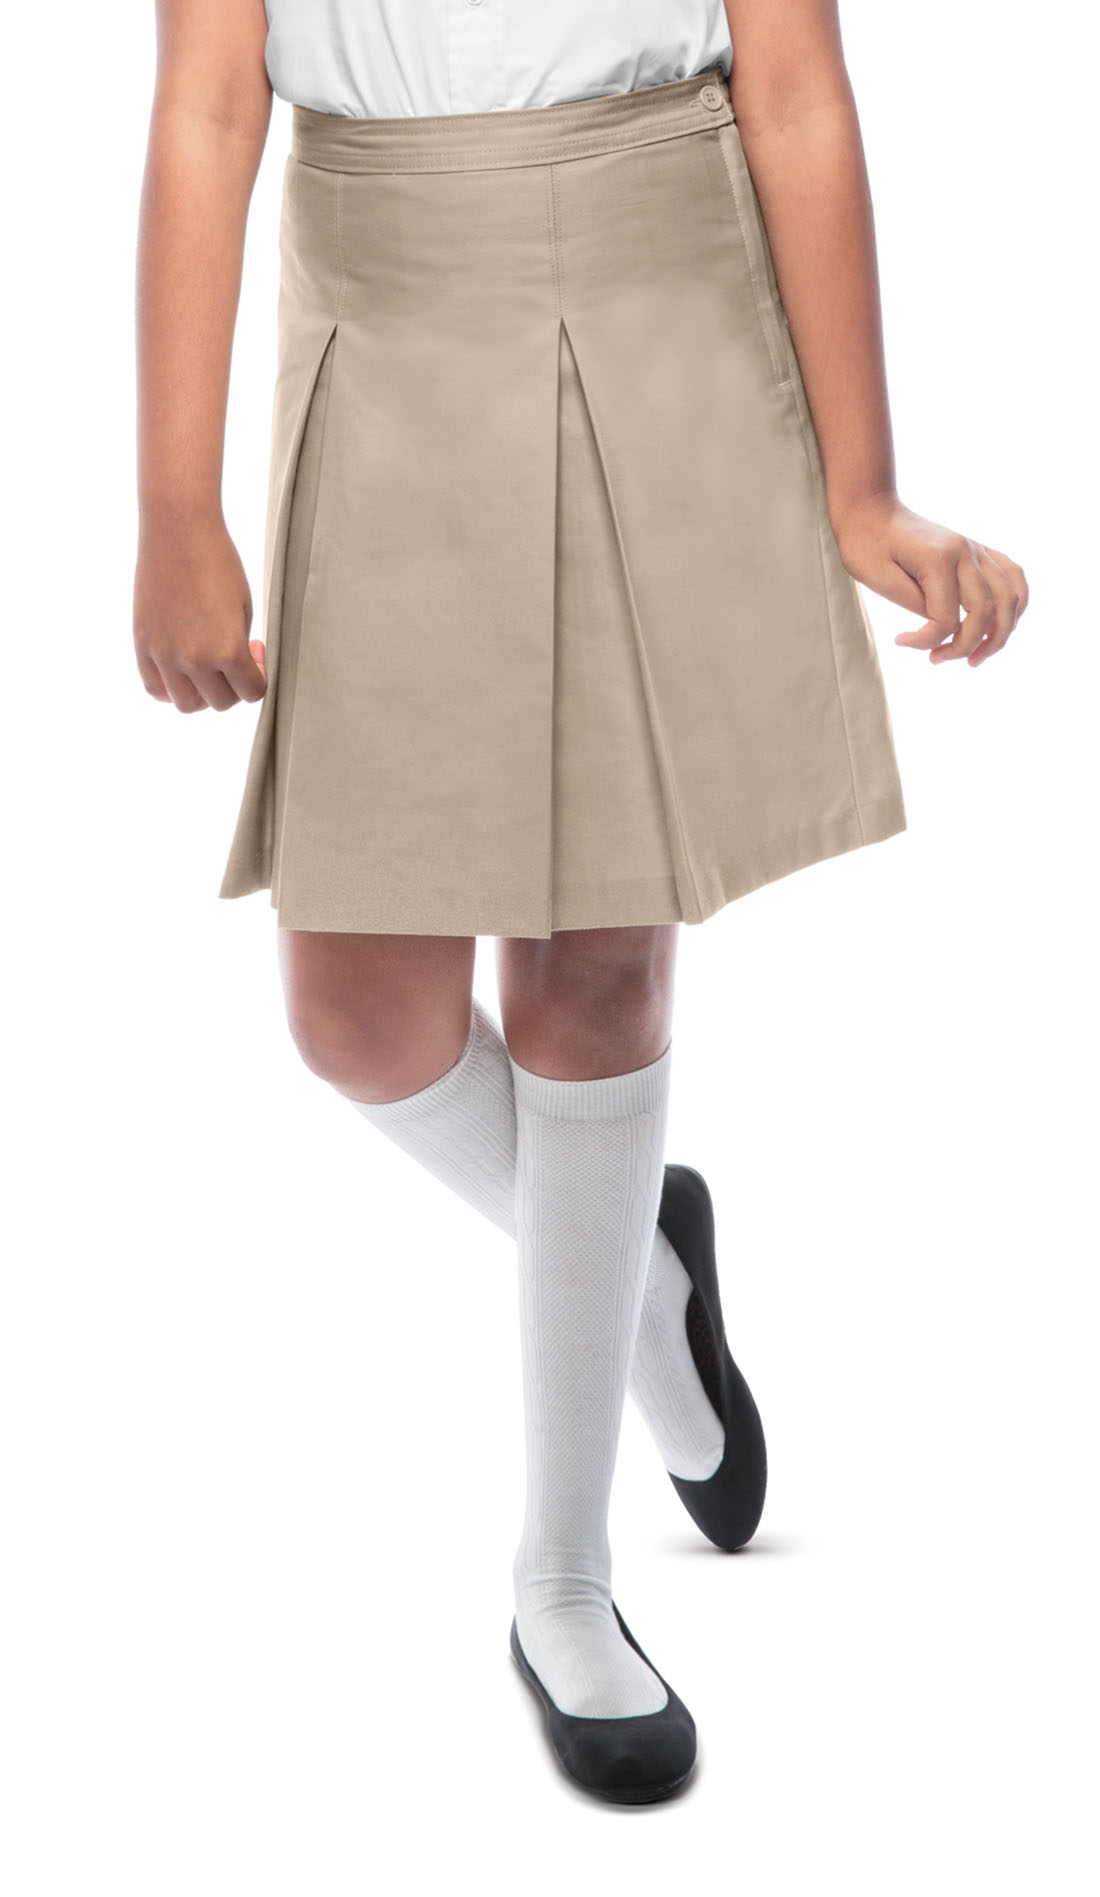 c60547dde3a4ff Classroom Girls Kick Pleat Skirt in Khaki 55862-KAK from Uniform ...